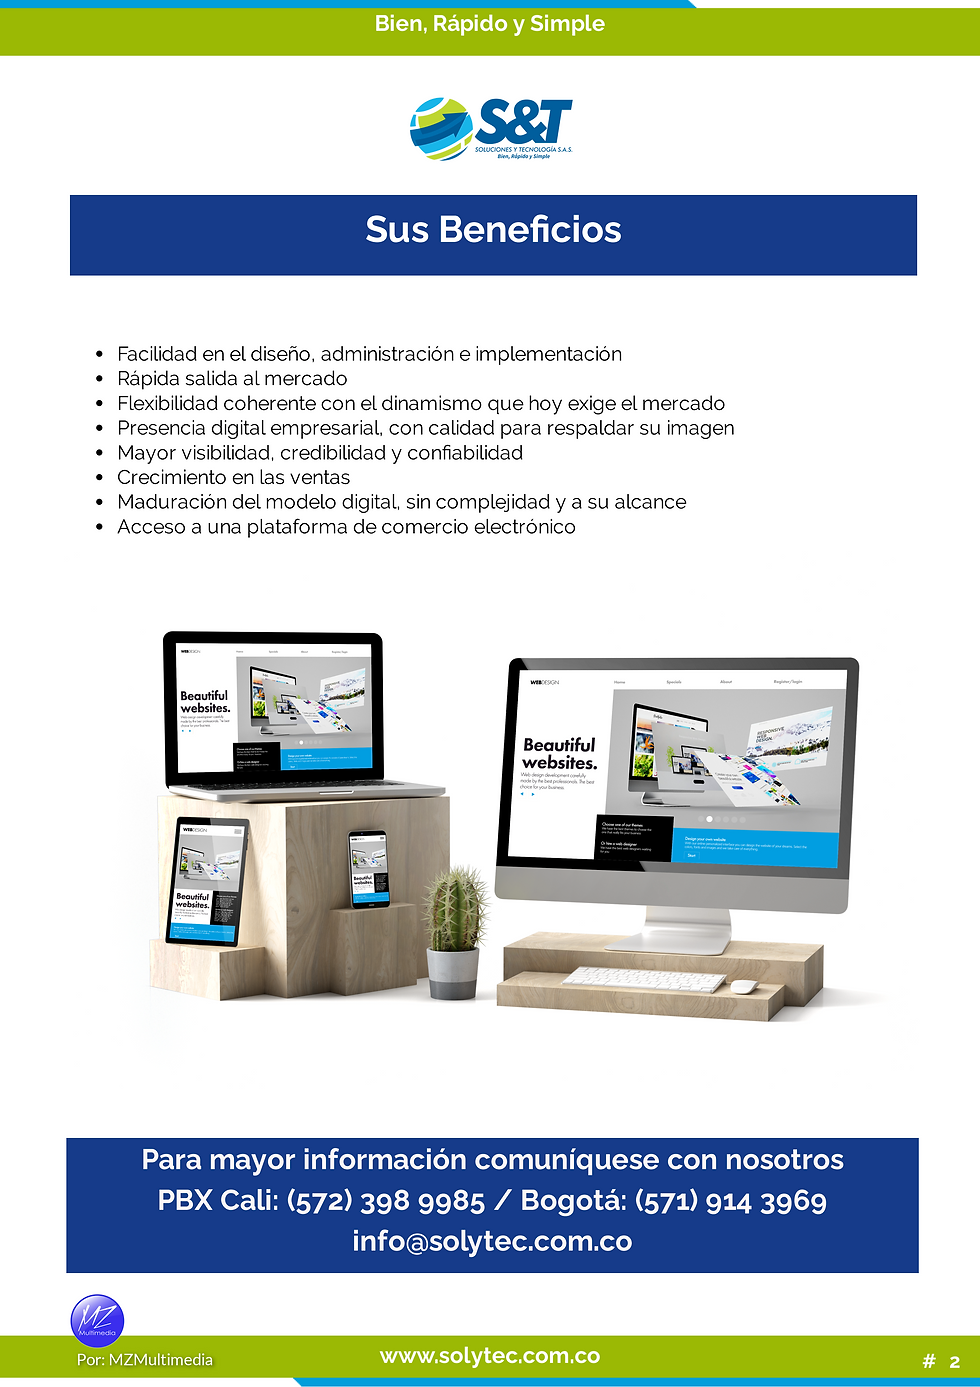 S&T Servicio Deluxe_3.png